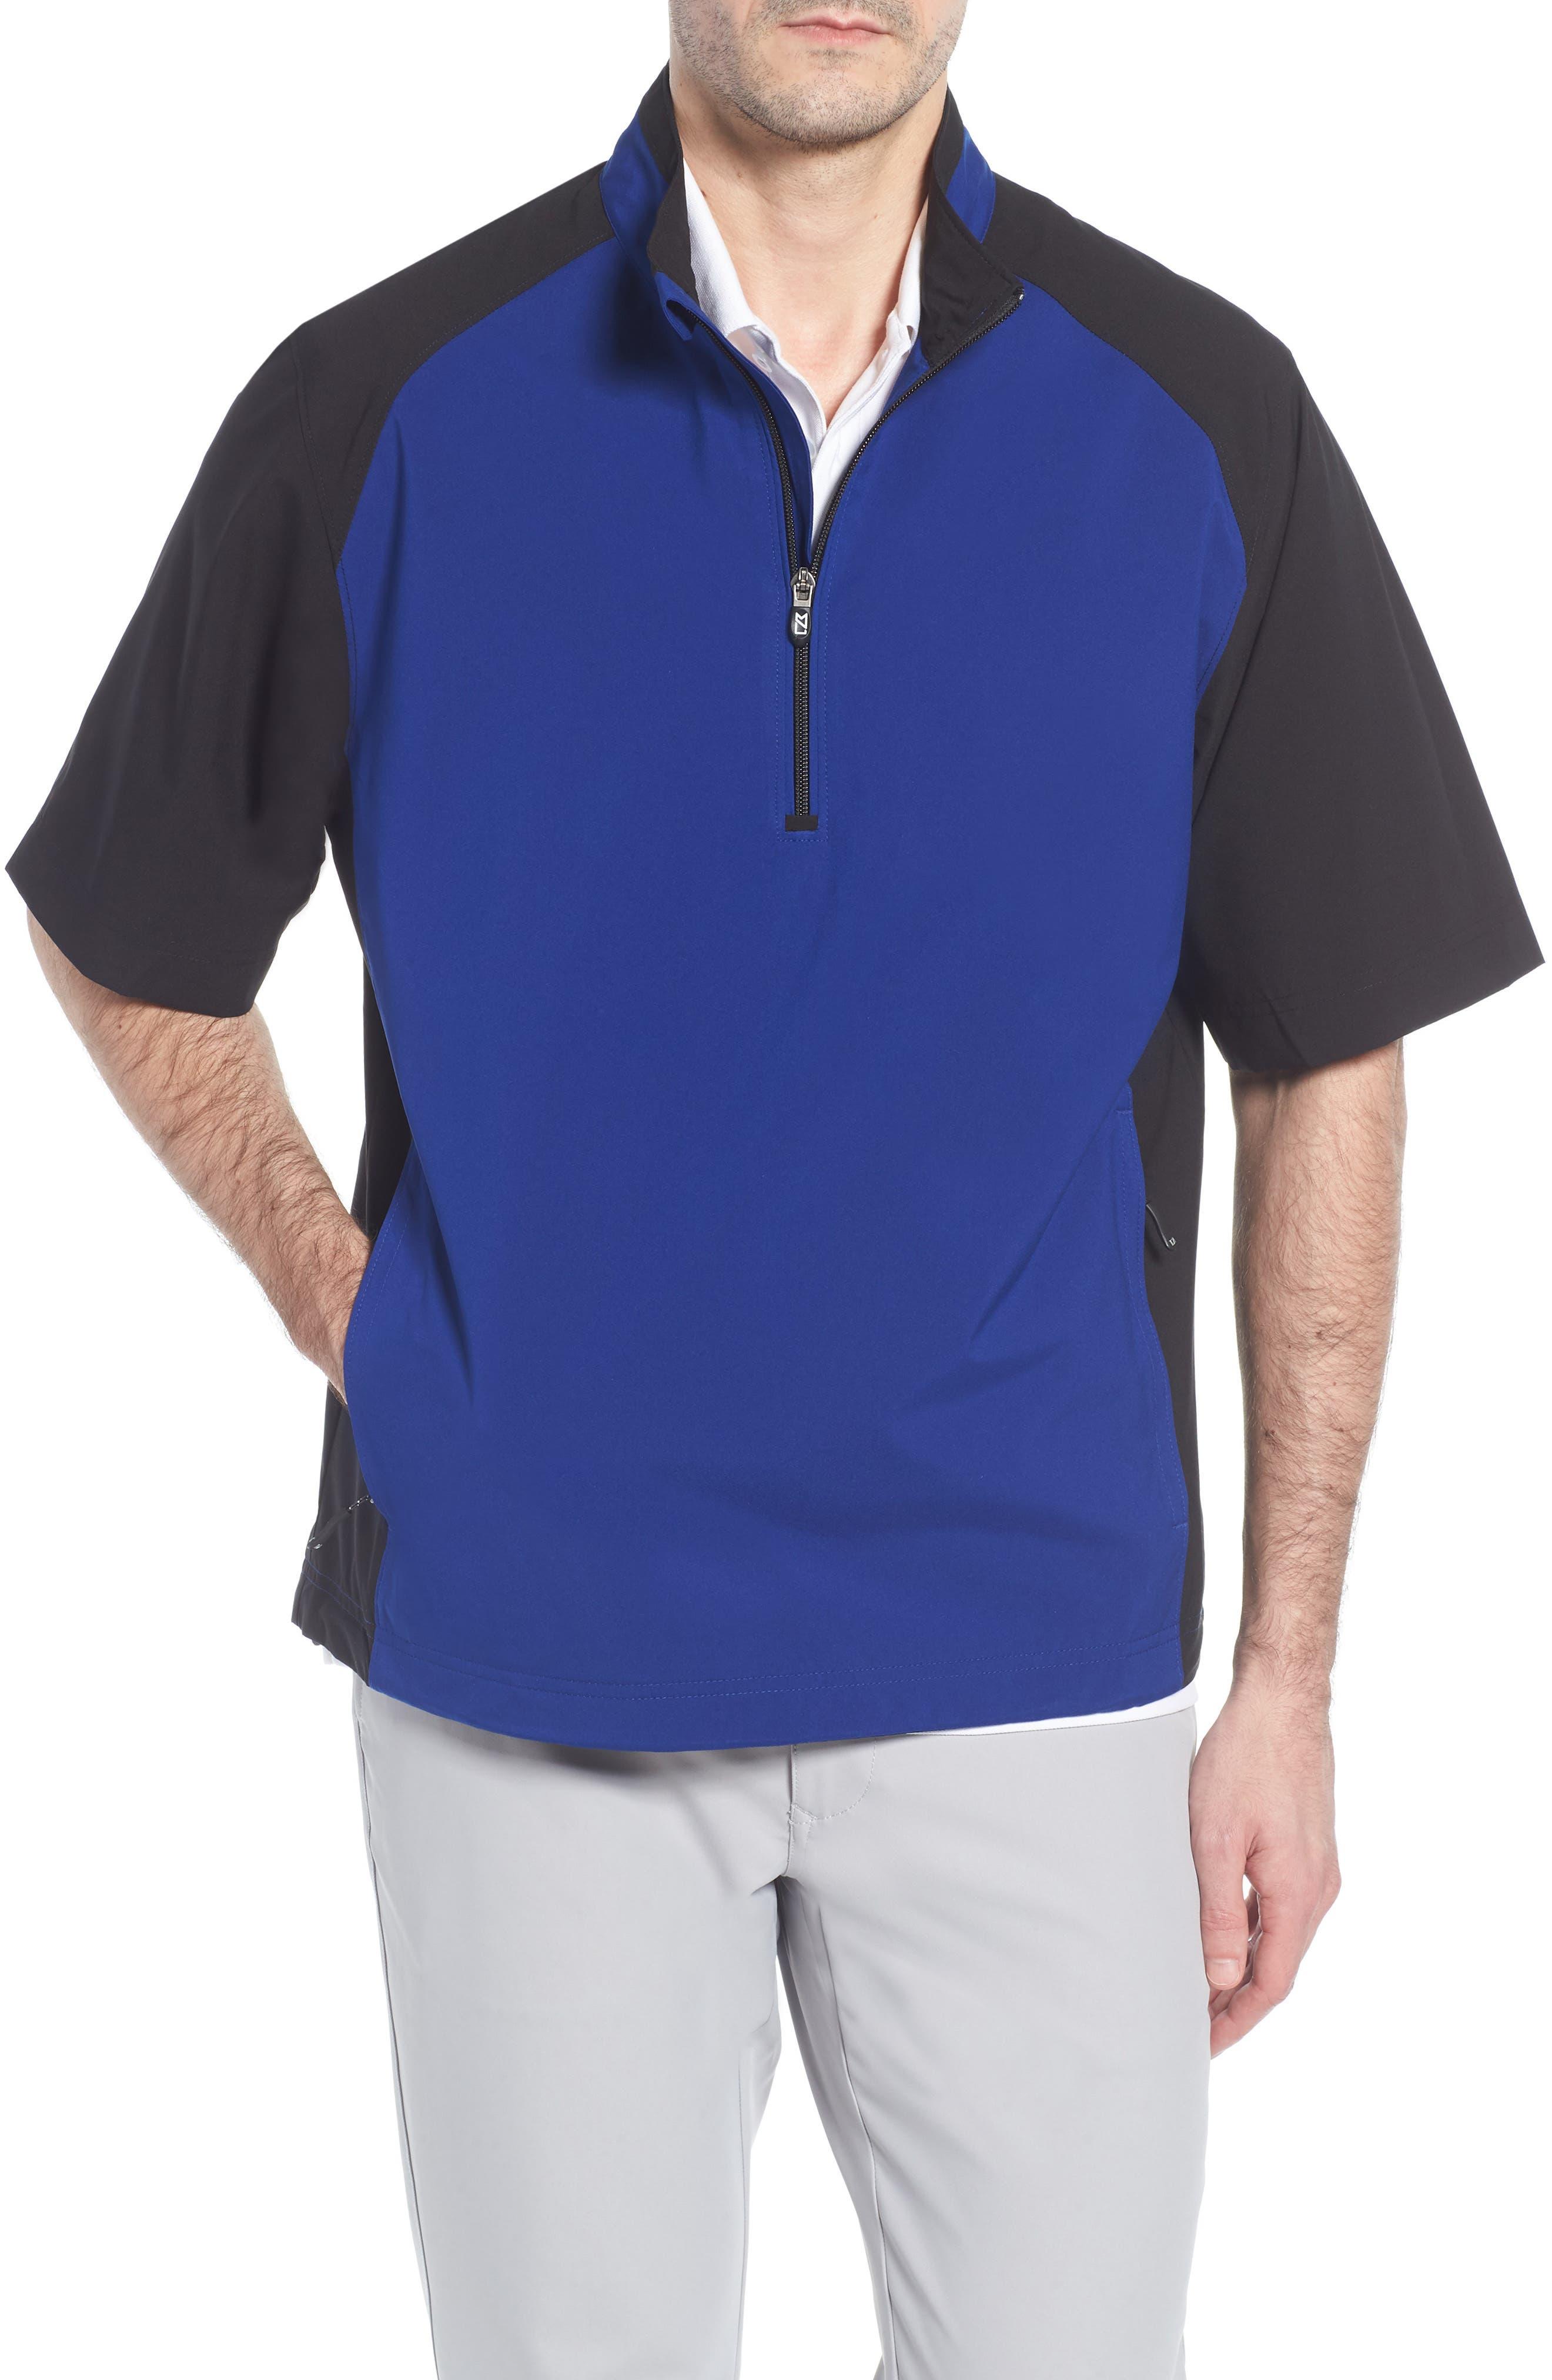 Alternate Image 1 Selected - Cutter & Buck 'WeatherTec Summit' Short Sleeve Shirt